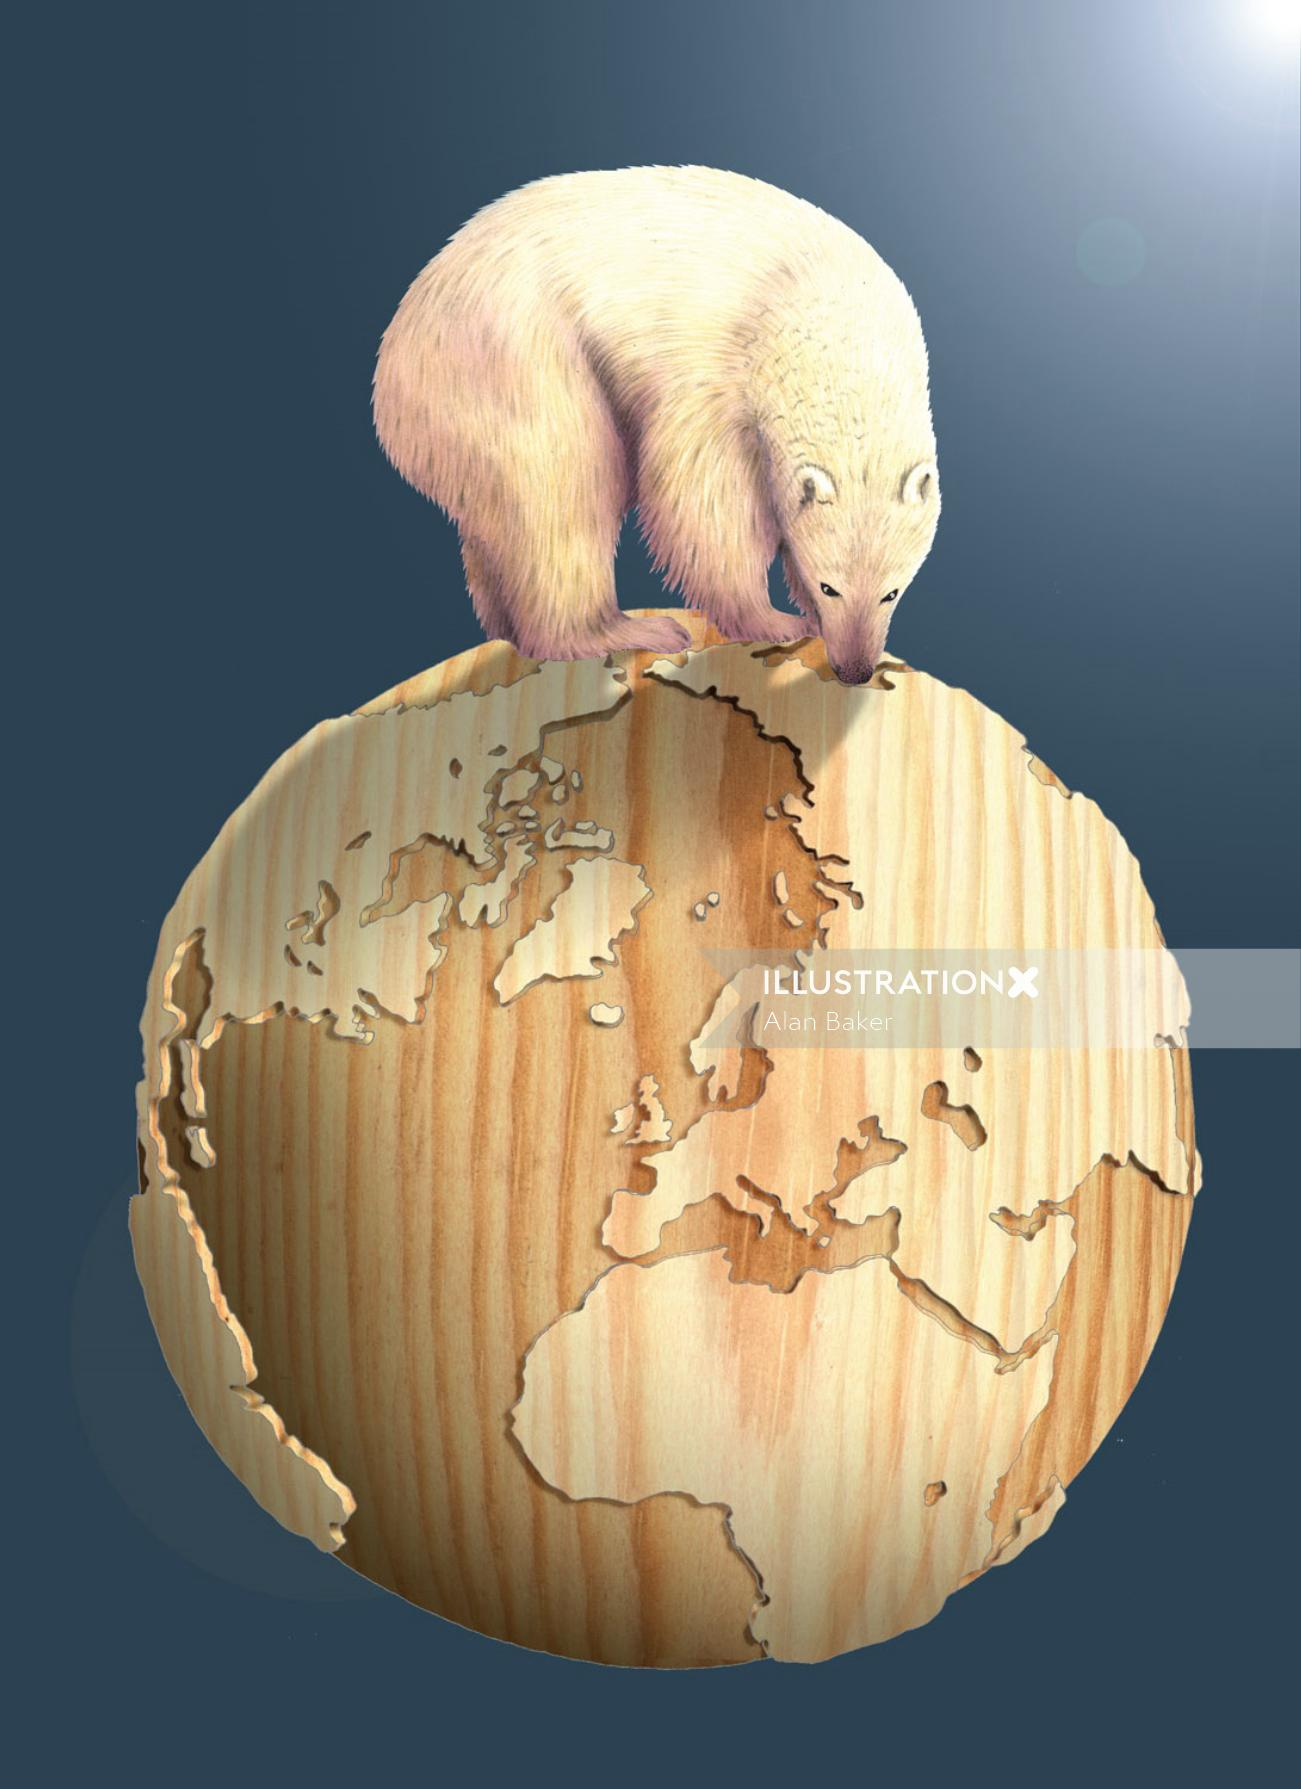 Polar bear on wooden globe - An illustration by Alan Baker